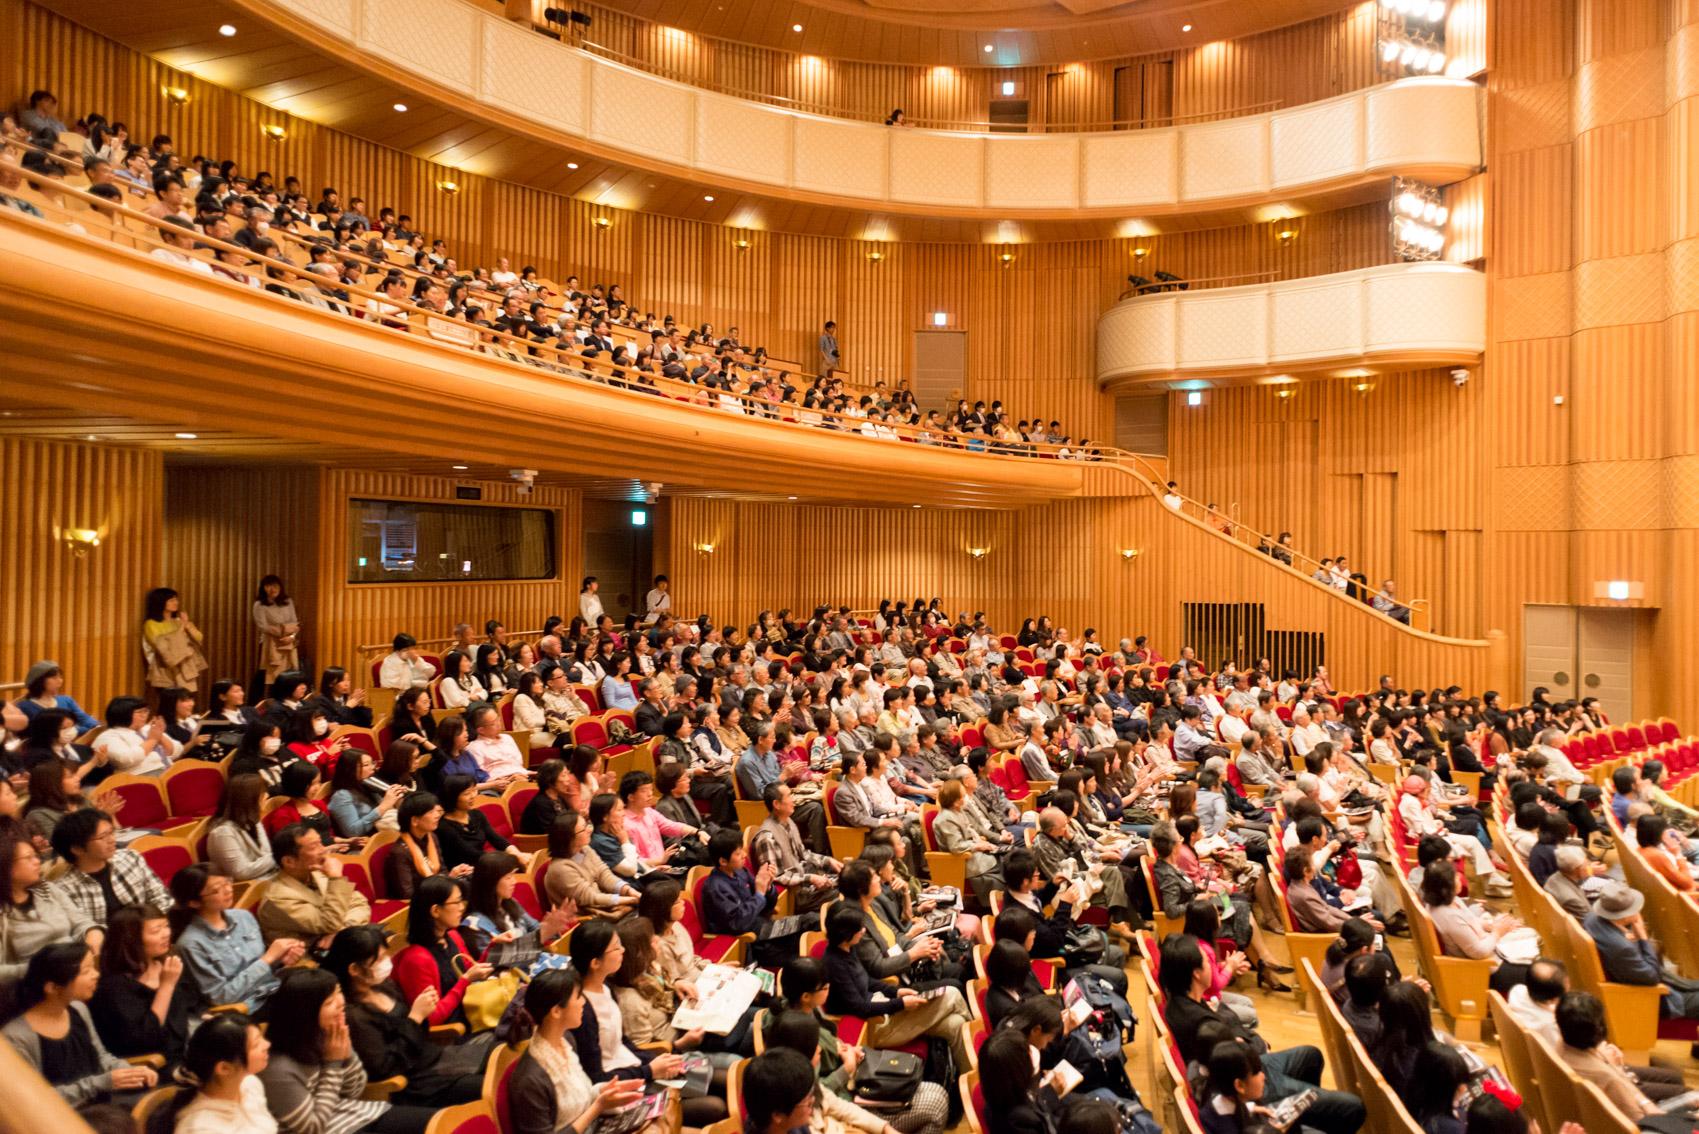 2014-10-18__Concert-Osaka_01